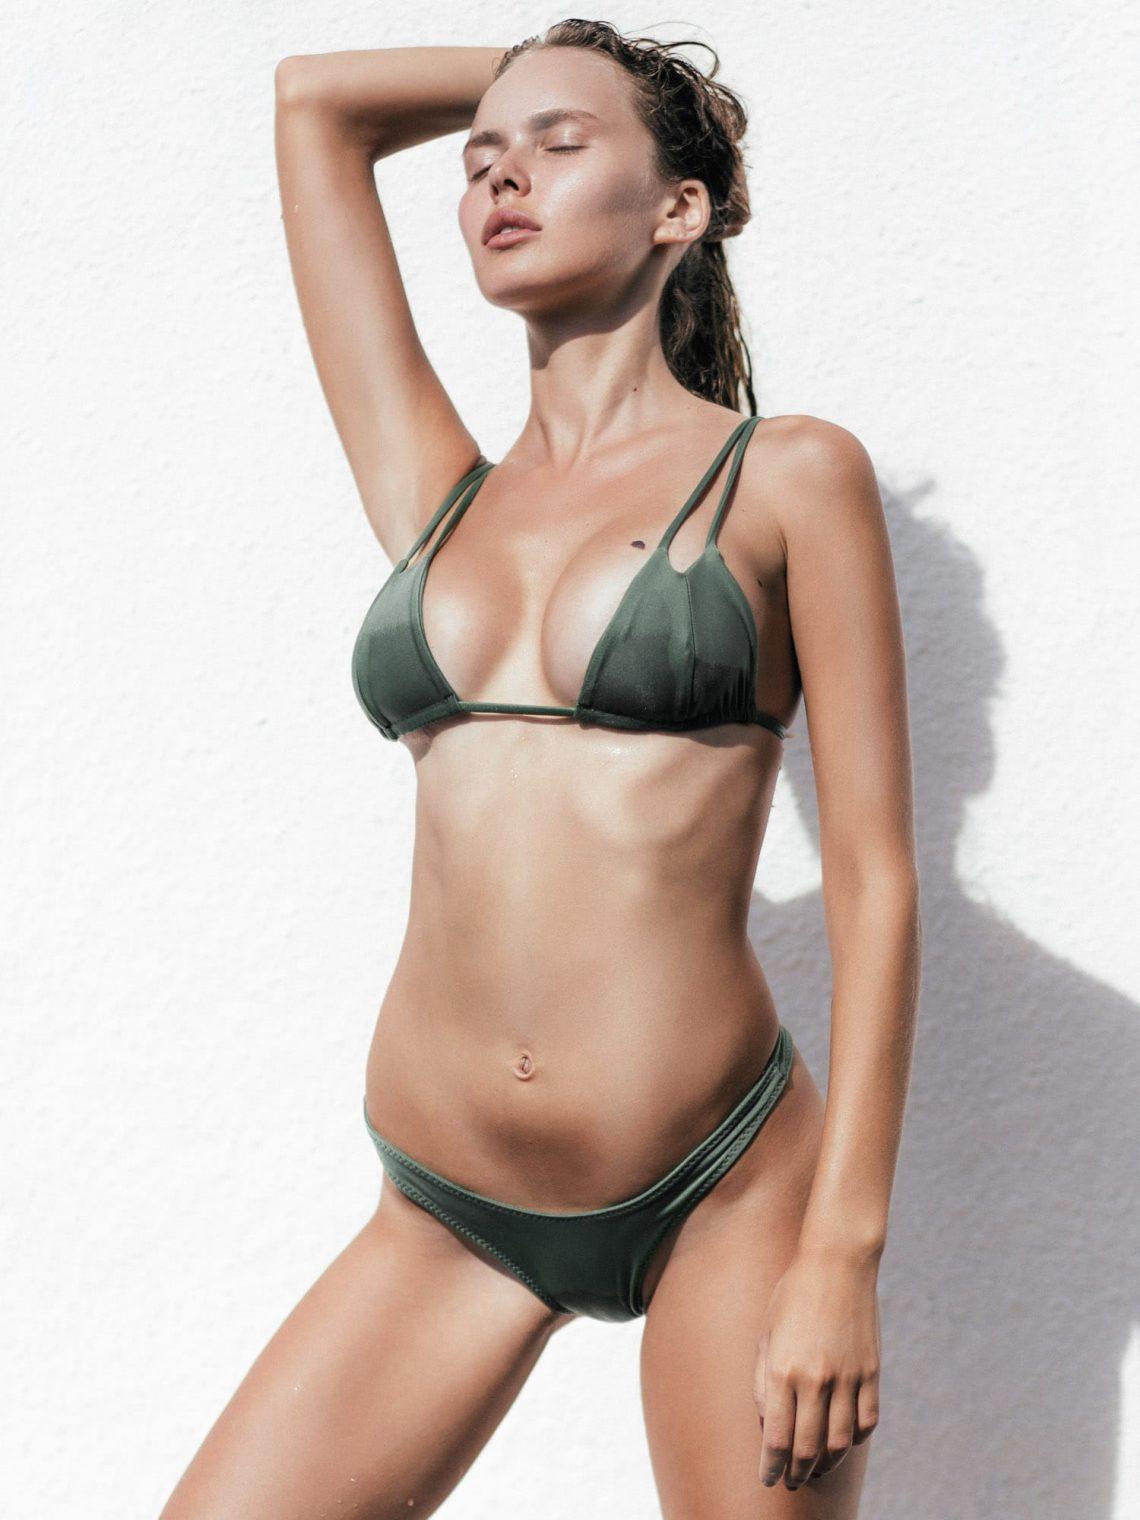 Balistarz-model-Angelina-Boyko-portrait-shoot-in-a-dark-green-bikini